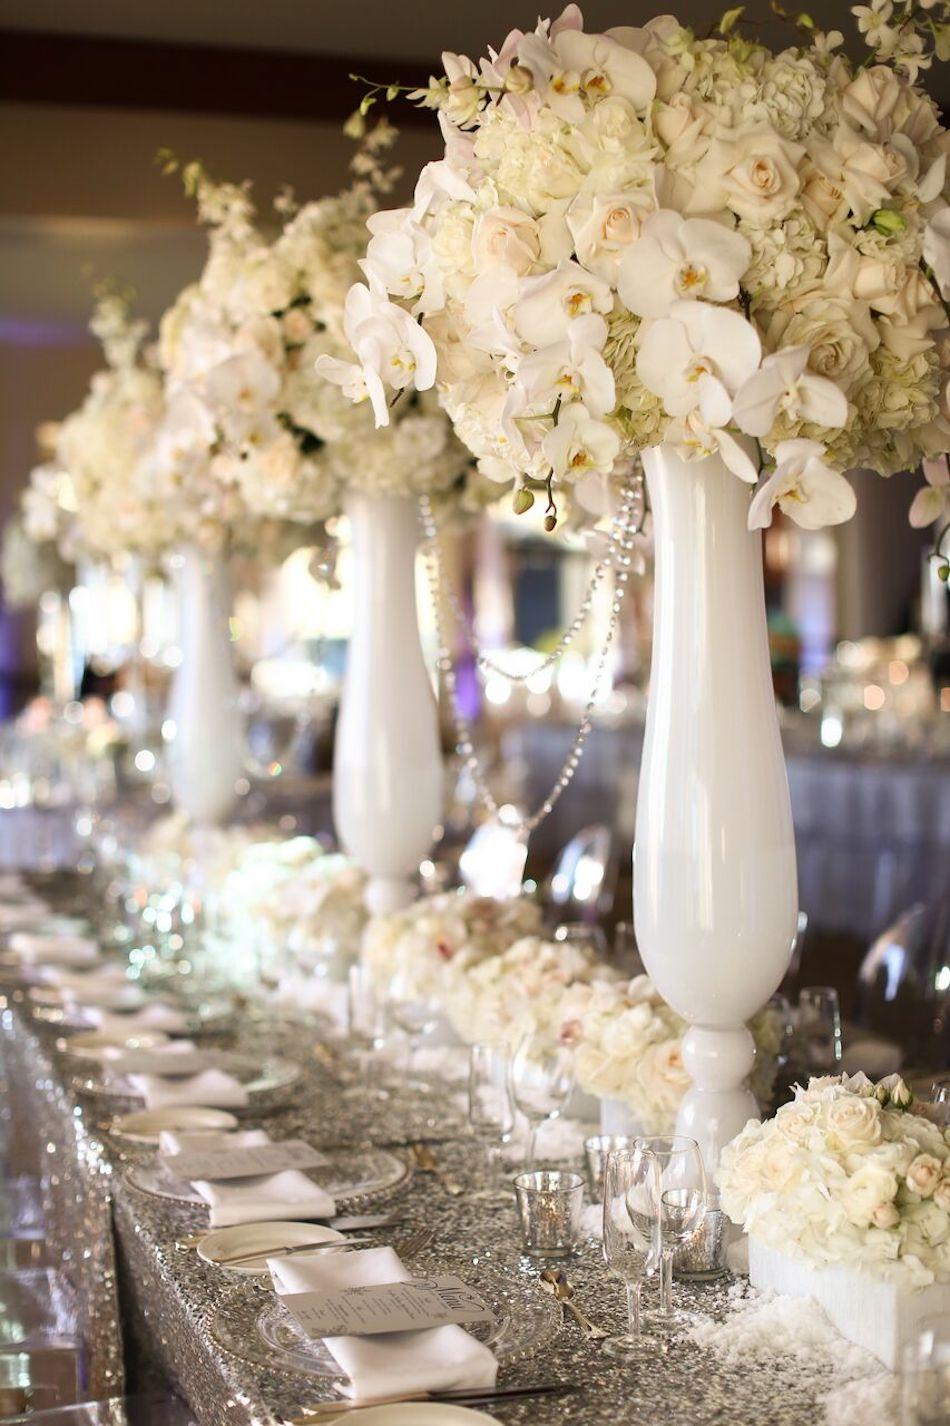 centerpieces, white flowers, all white wedding, orange county florist, bel air bay club, wedding, flowers by cina